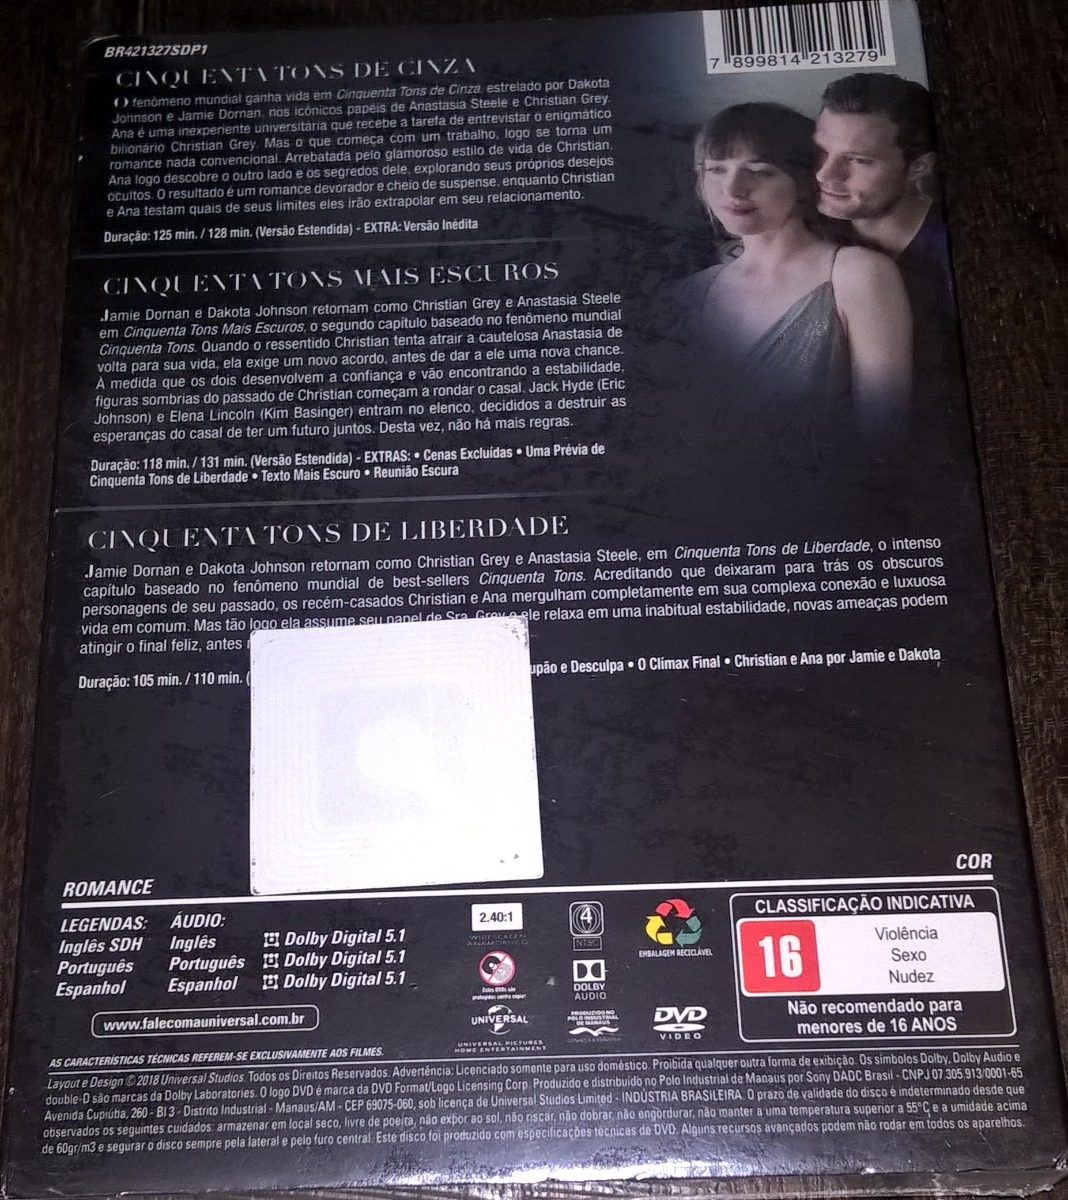 50 Tons Mais Escuros Filme Completo Dublado Completo box cinquenta tons de cinza - 3 filmes - estendida - lacrado